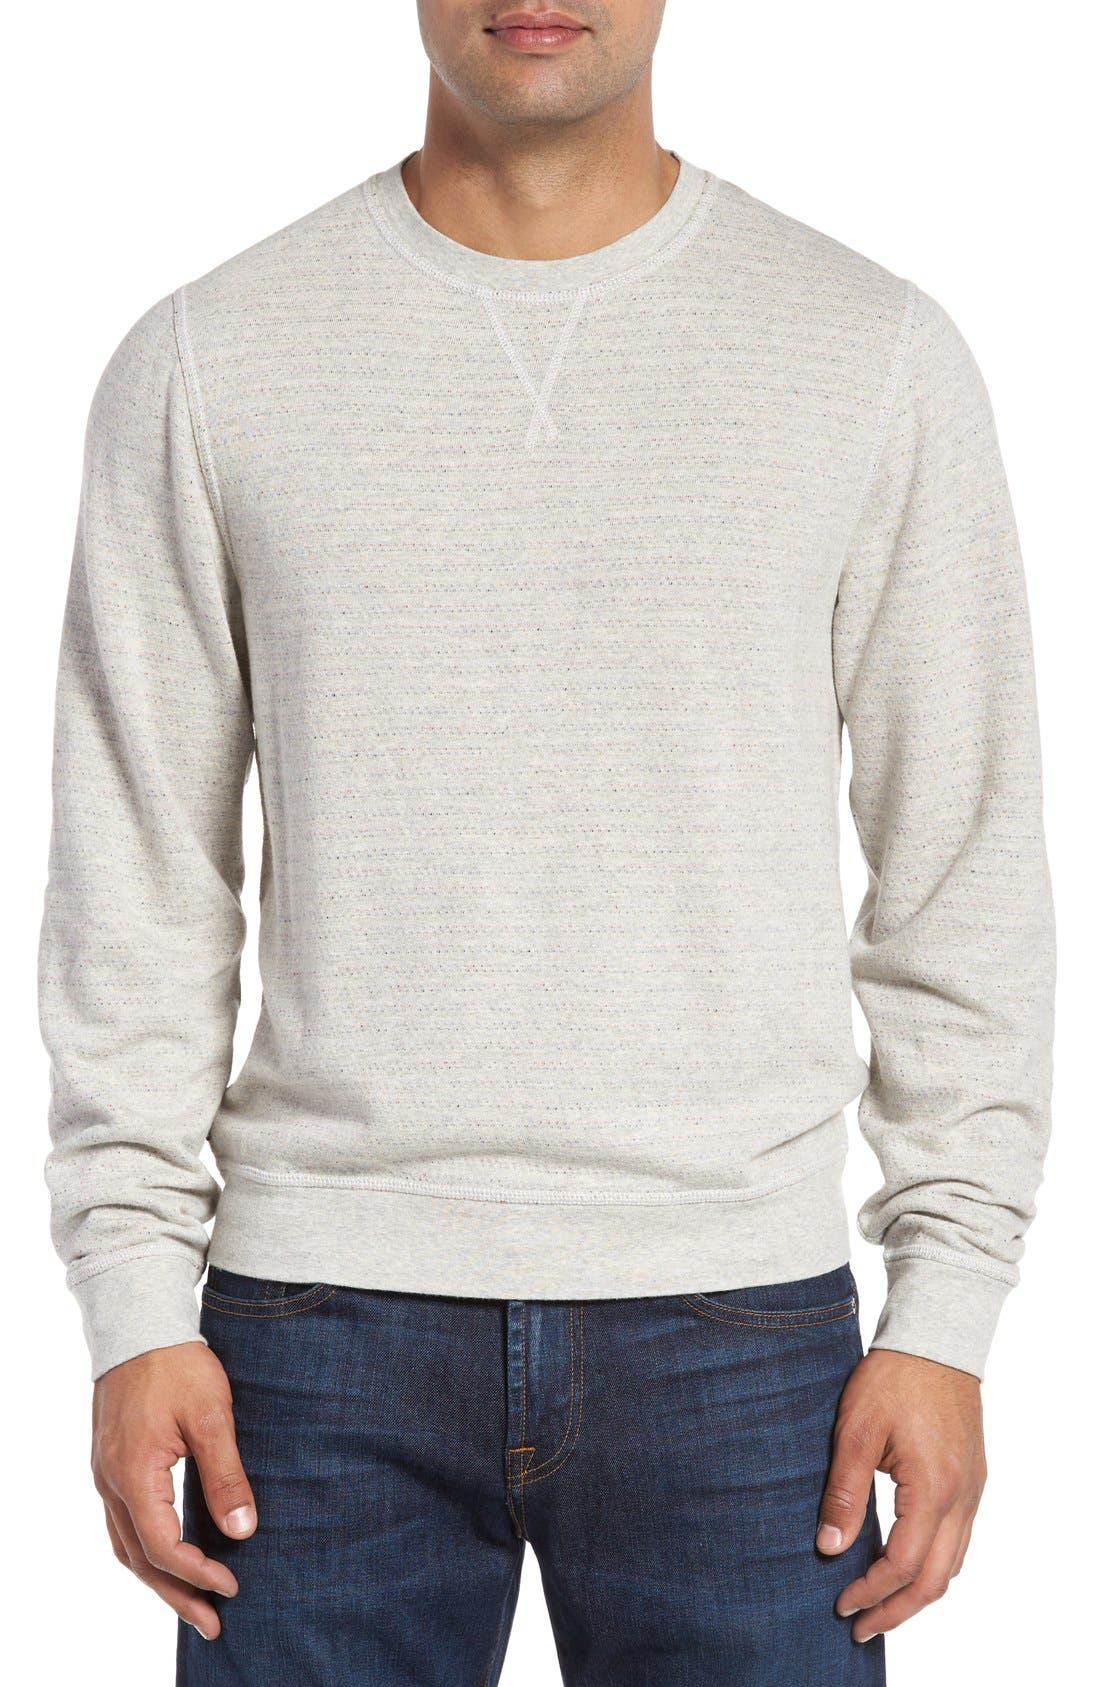 'Gleann' French Terry Crewneck Sweatshirt,                         Main,                         color, 250